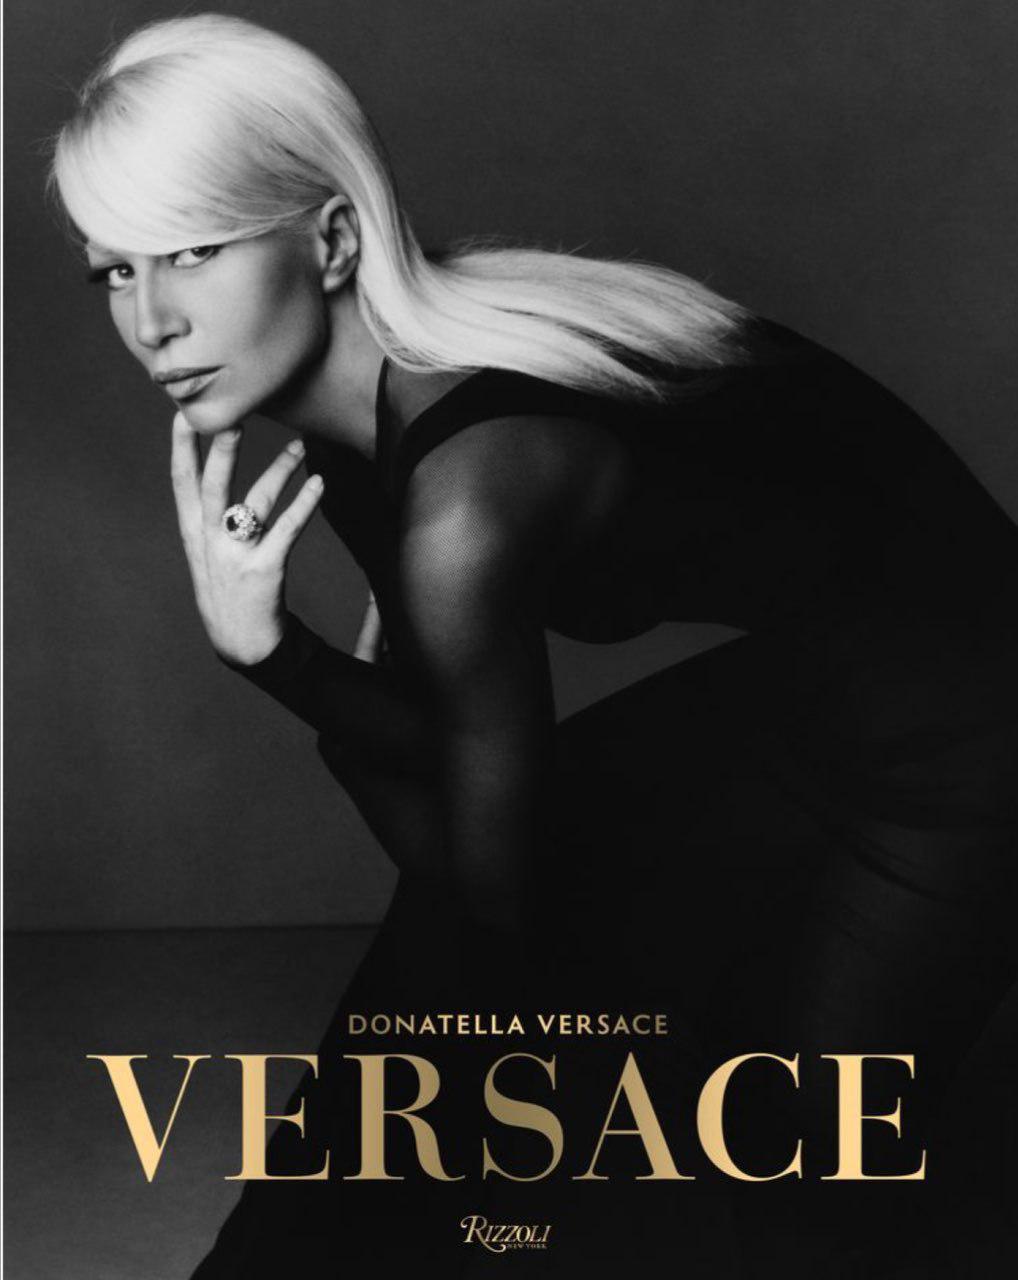 دوناتلا ورساچه Donatella Versace